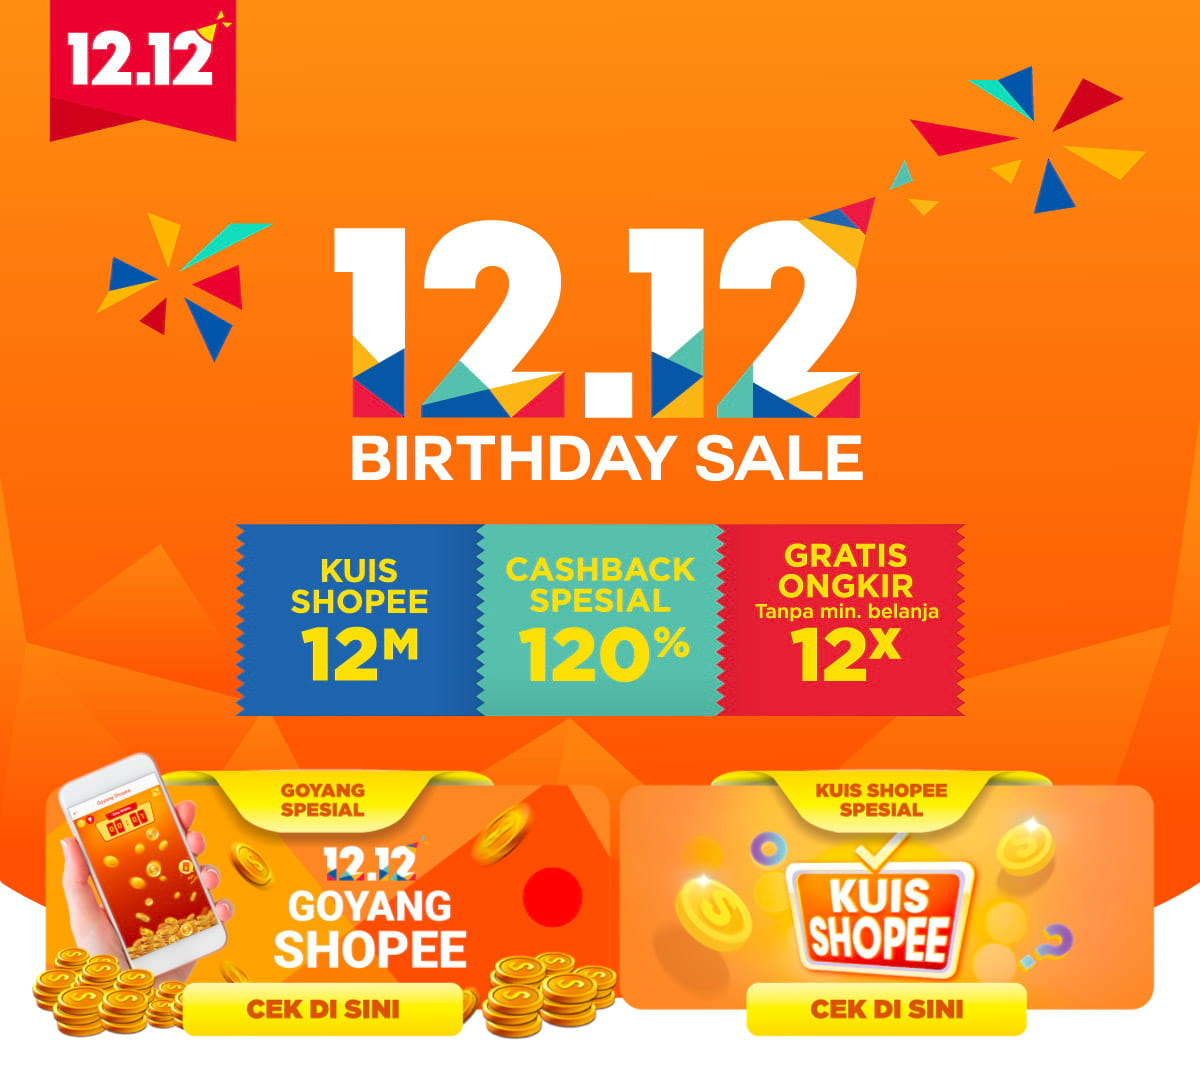 Shopee - Promo Cashback , Kuis & Gratis Ongkir di Birthday Sale 12.12